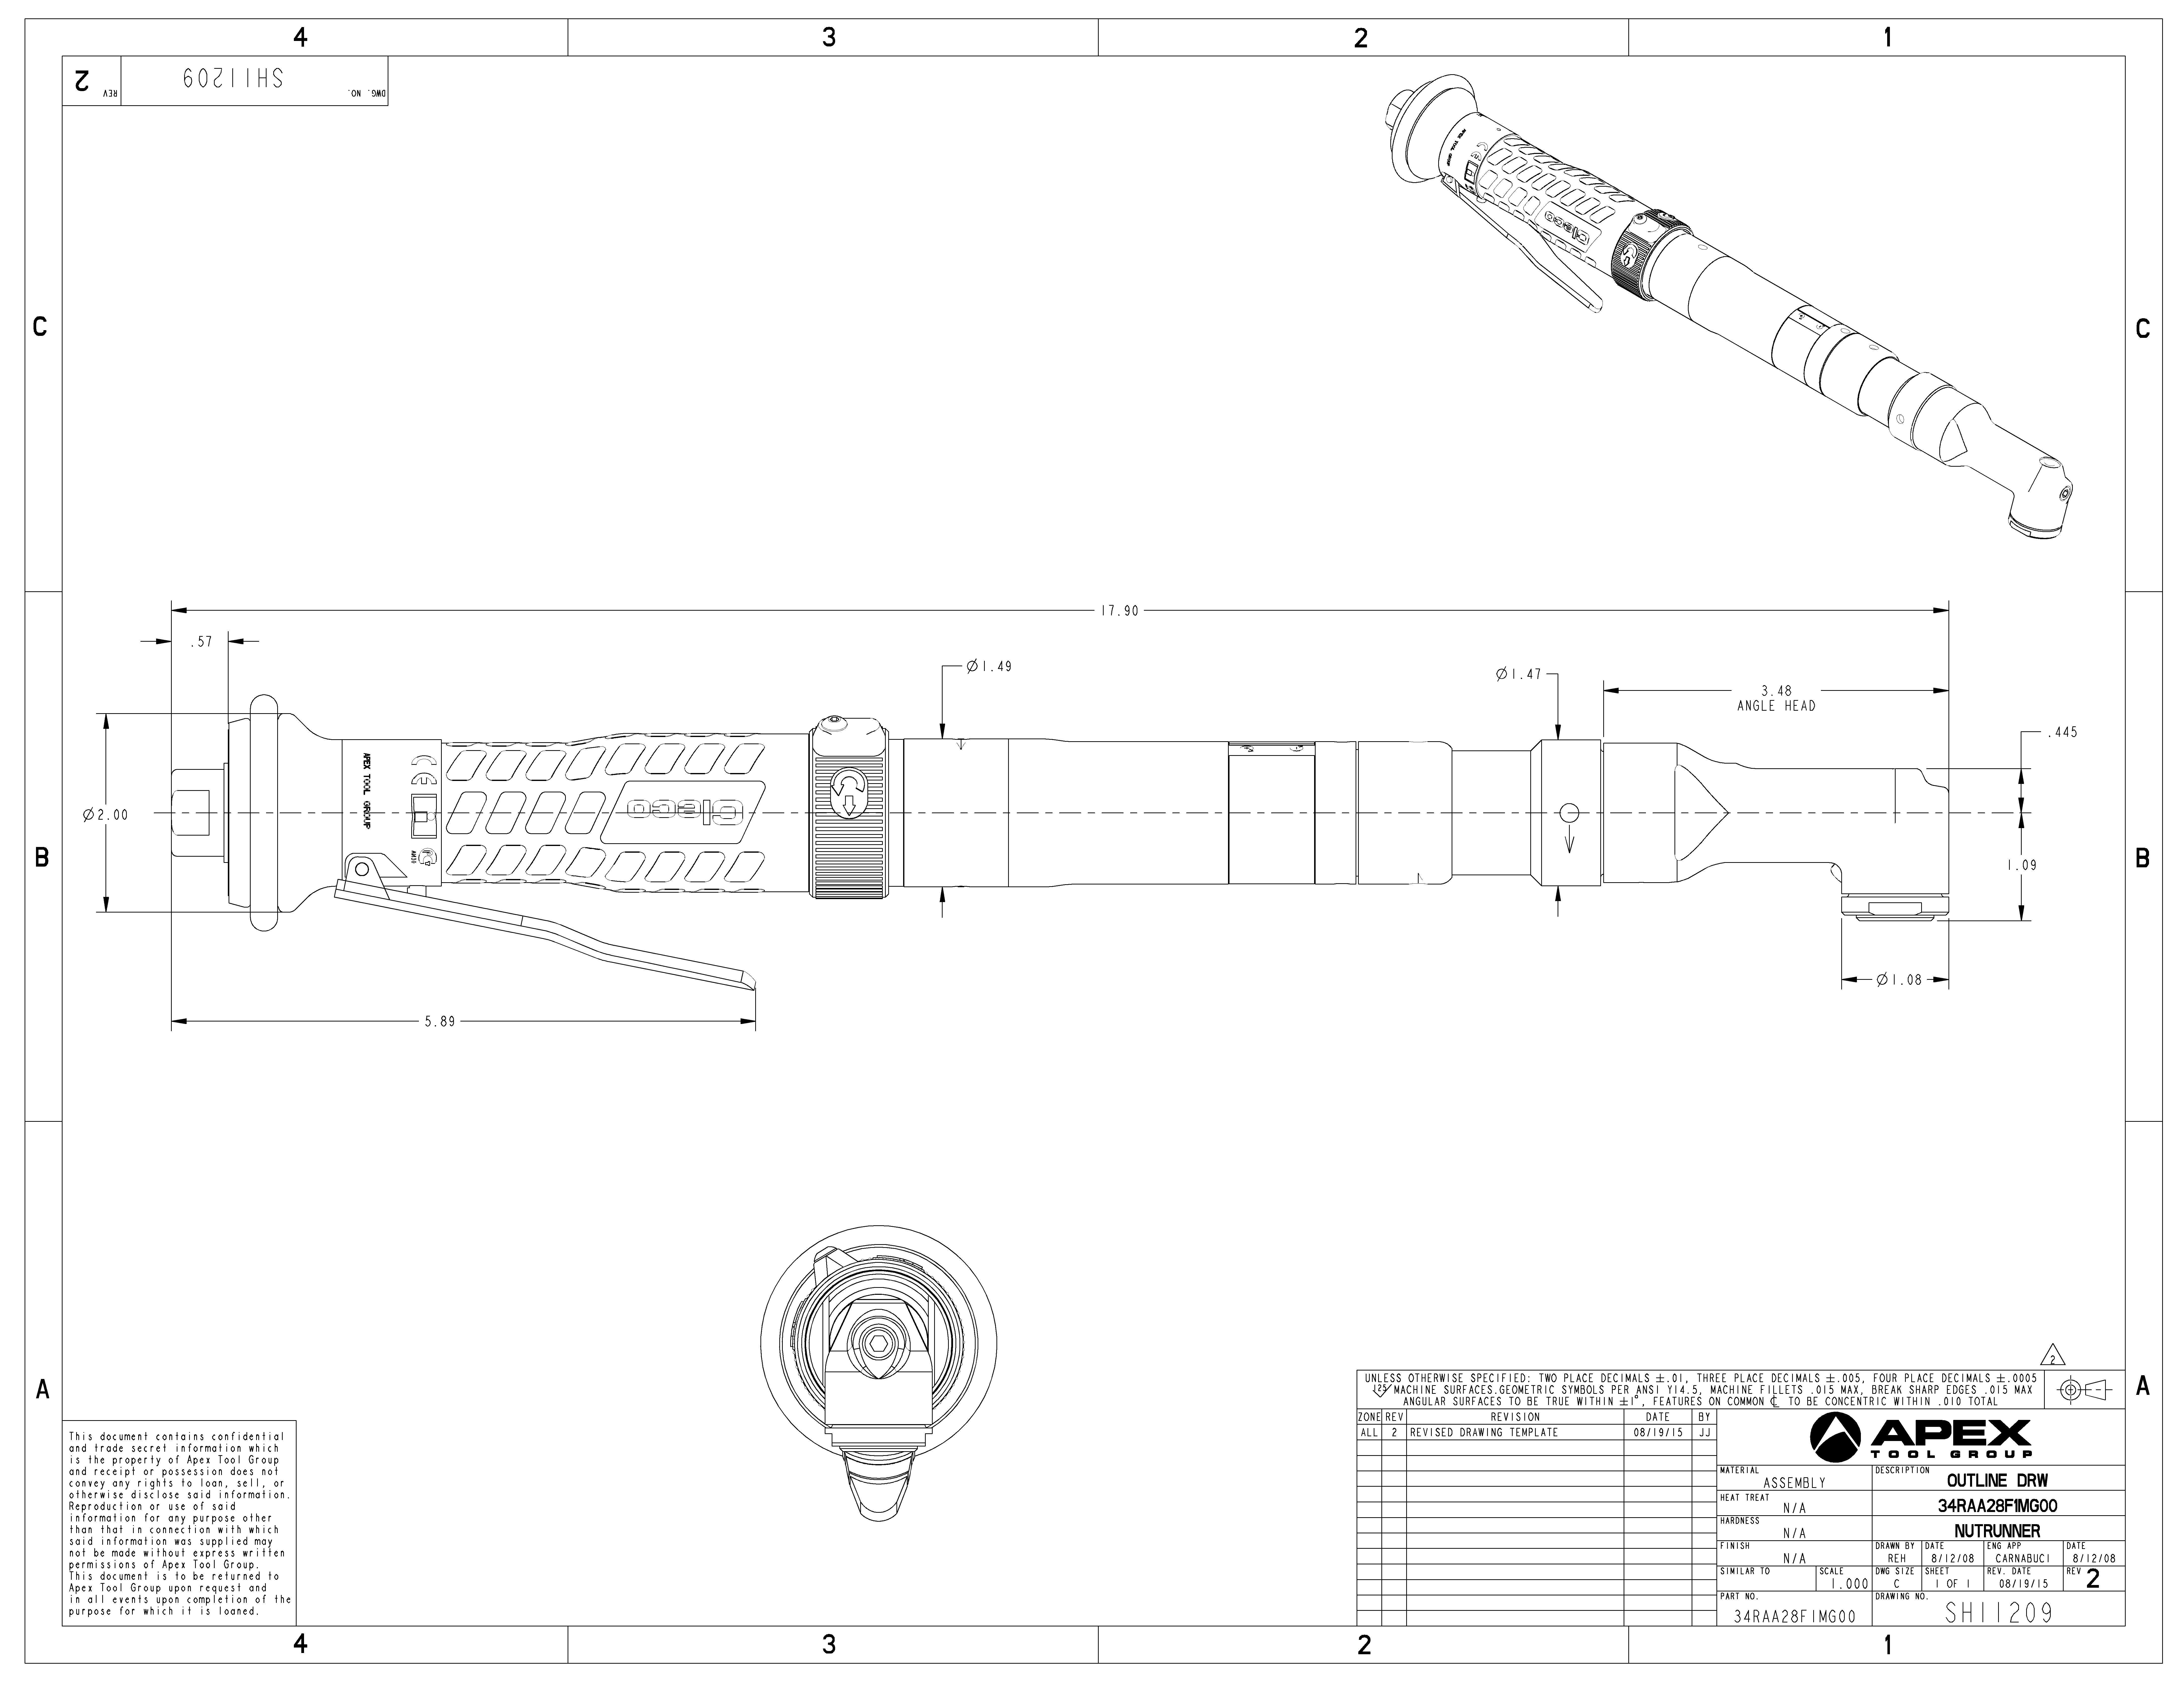 cleco-flush-nutrunner-engineered-drawing.jpg